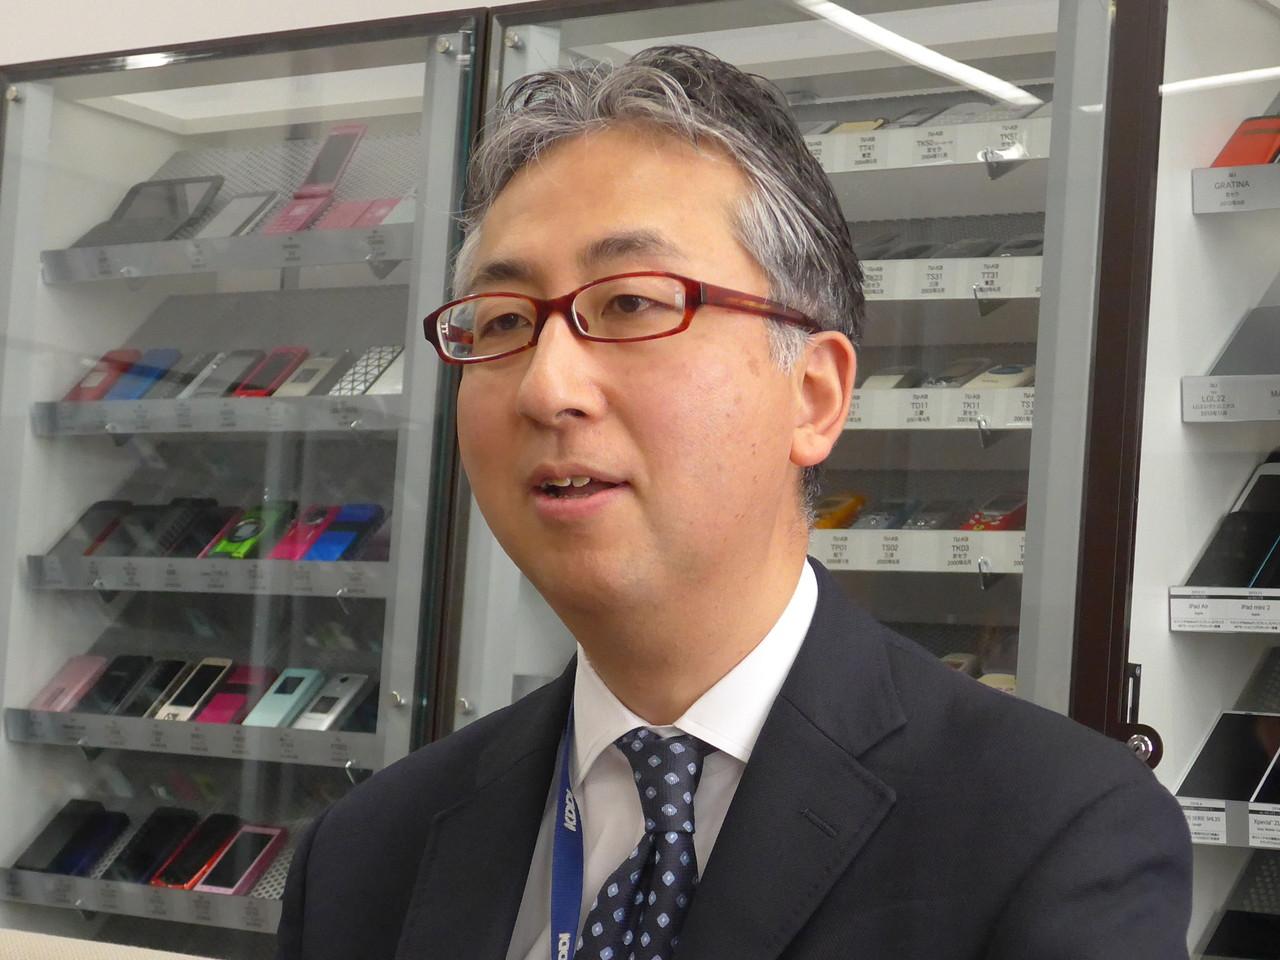 KDDI株式会社商品企画本部ホーム・IoTサービス企画部ブロードバンドプラットフォームグループリーダーの小松俊介氏